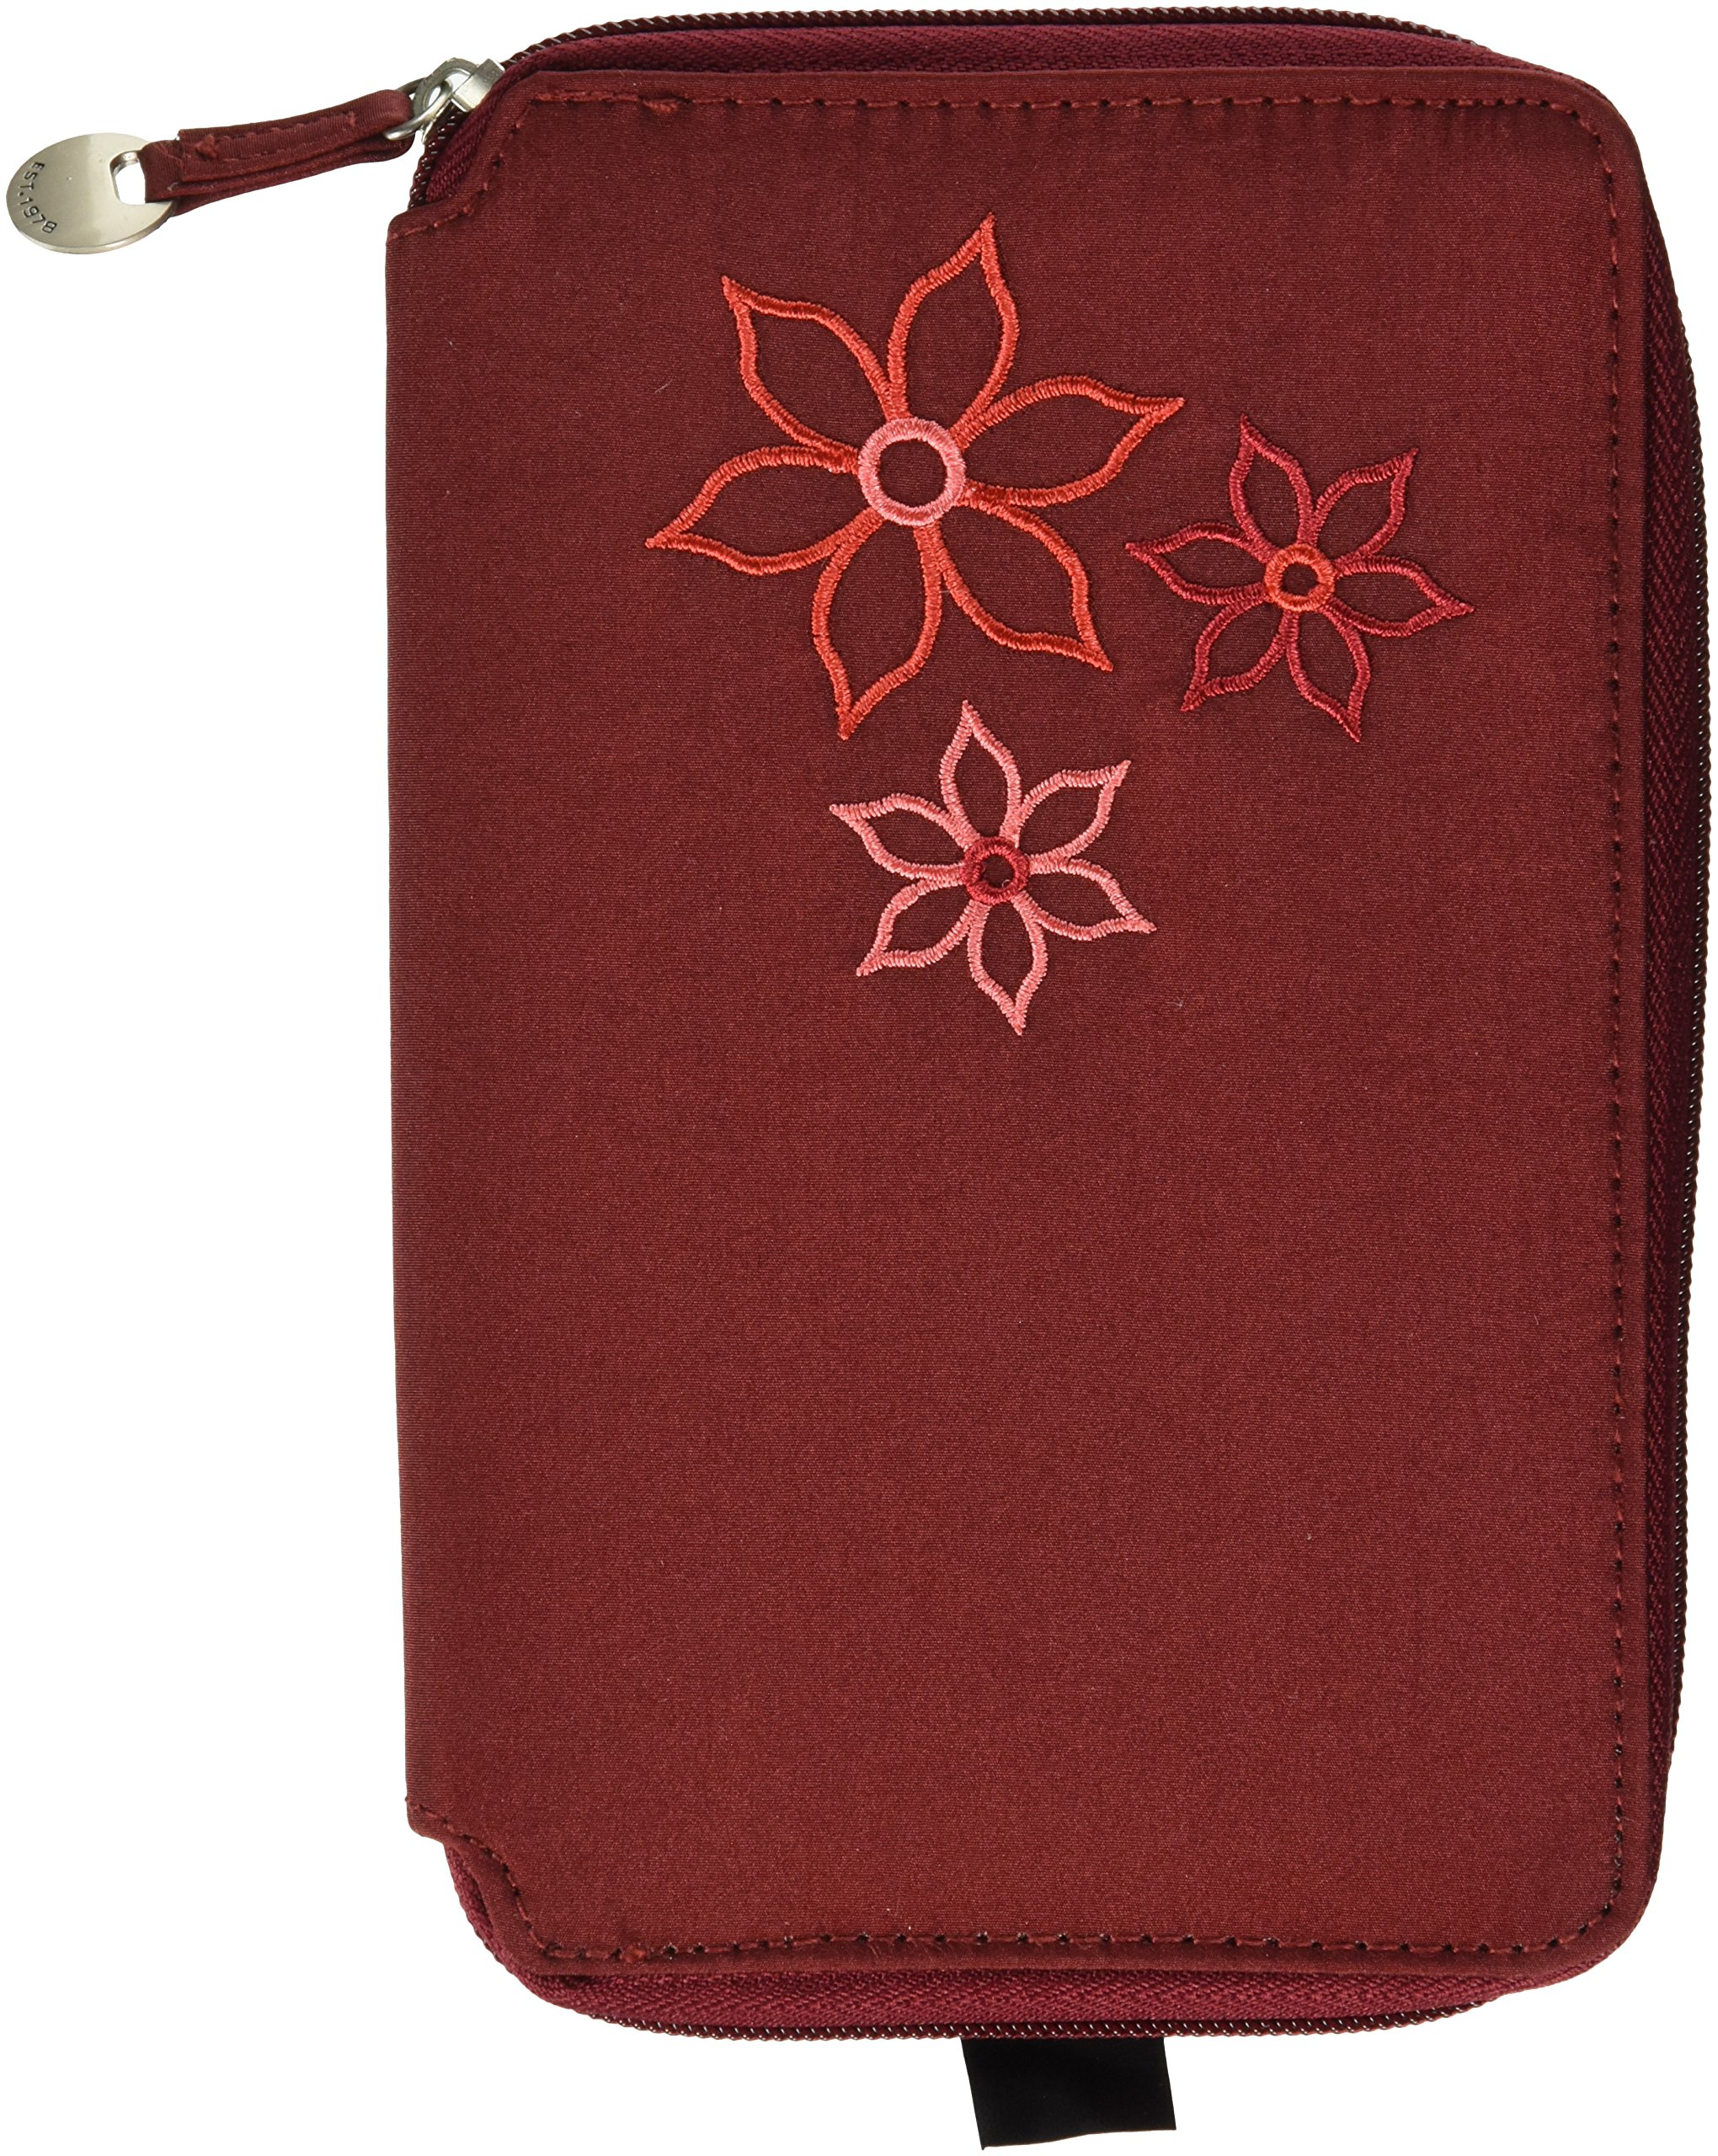 Travelon RFID Blocking Bouquet Family Passport Case, Wine